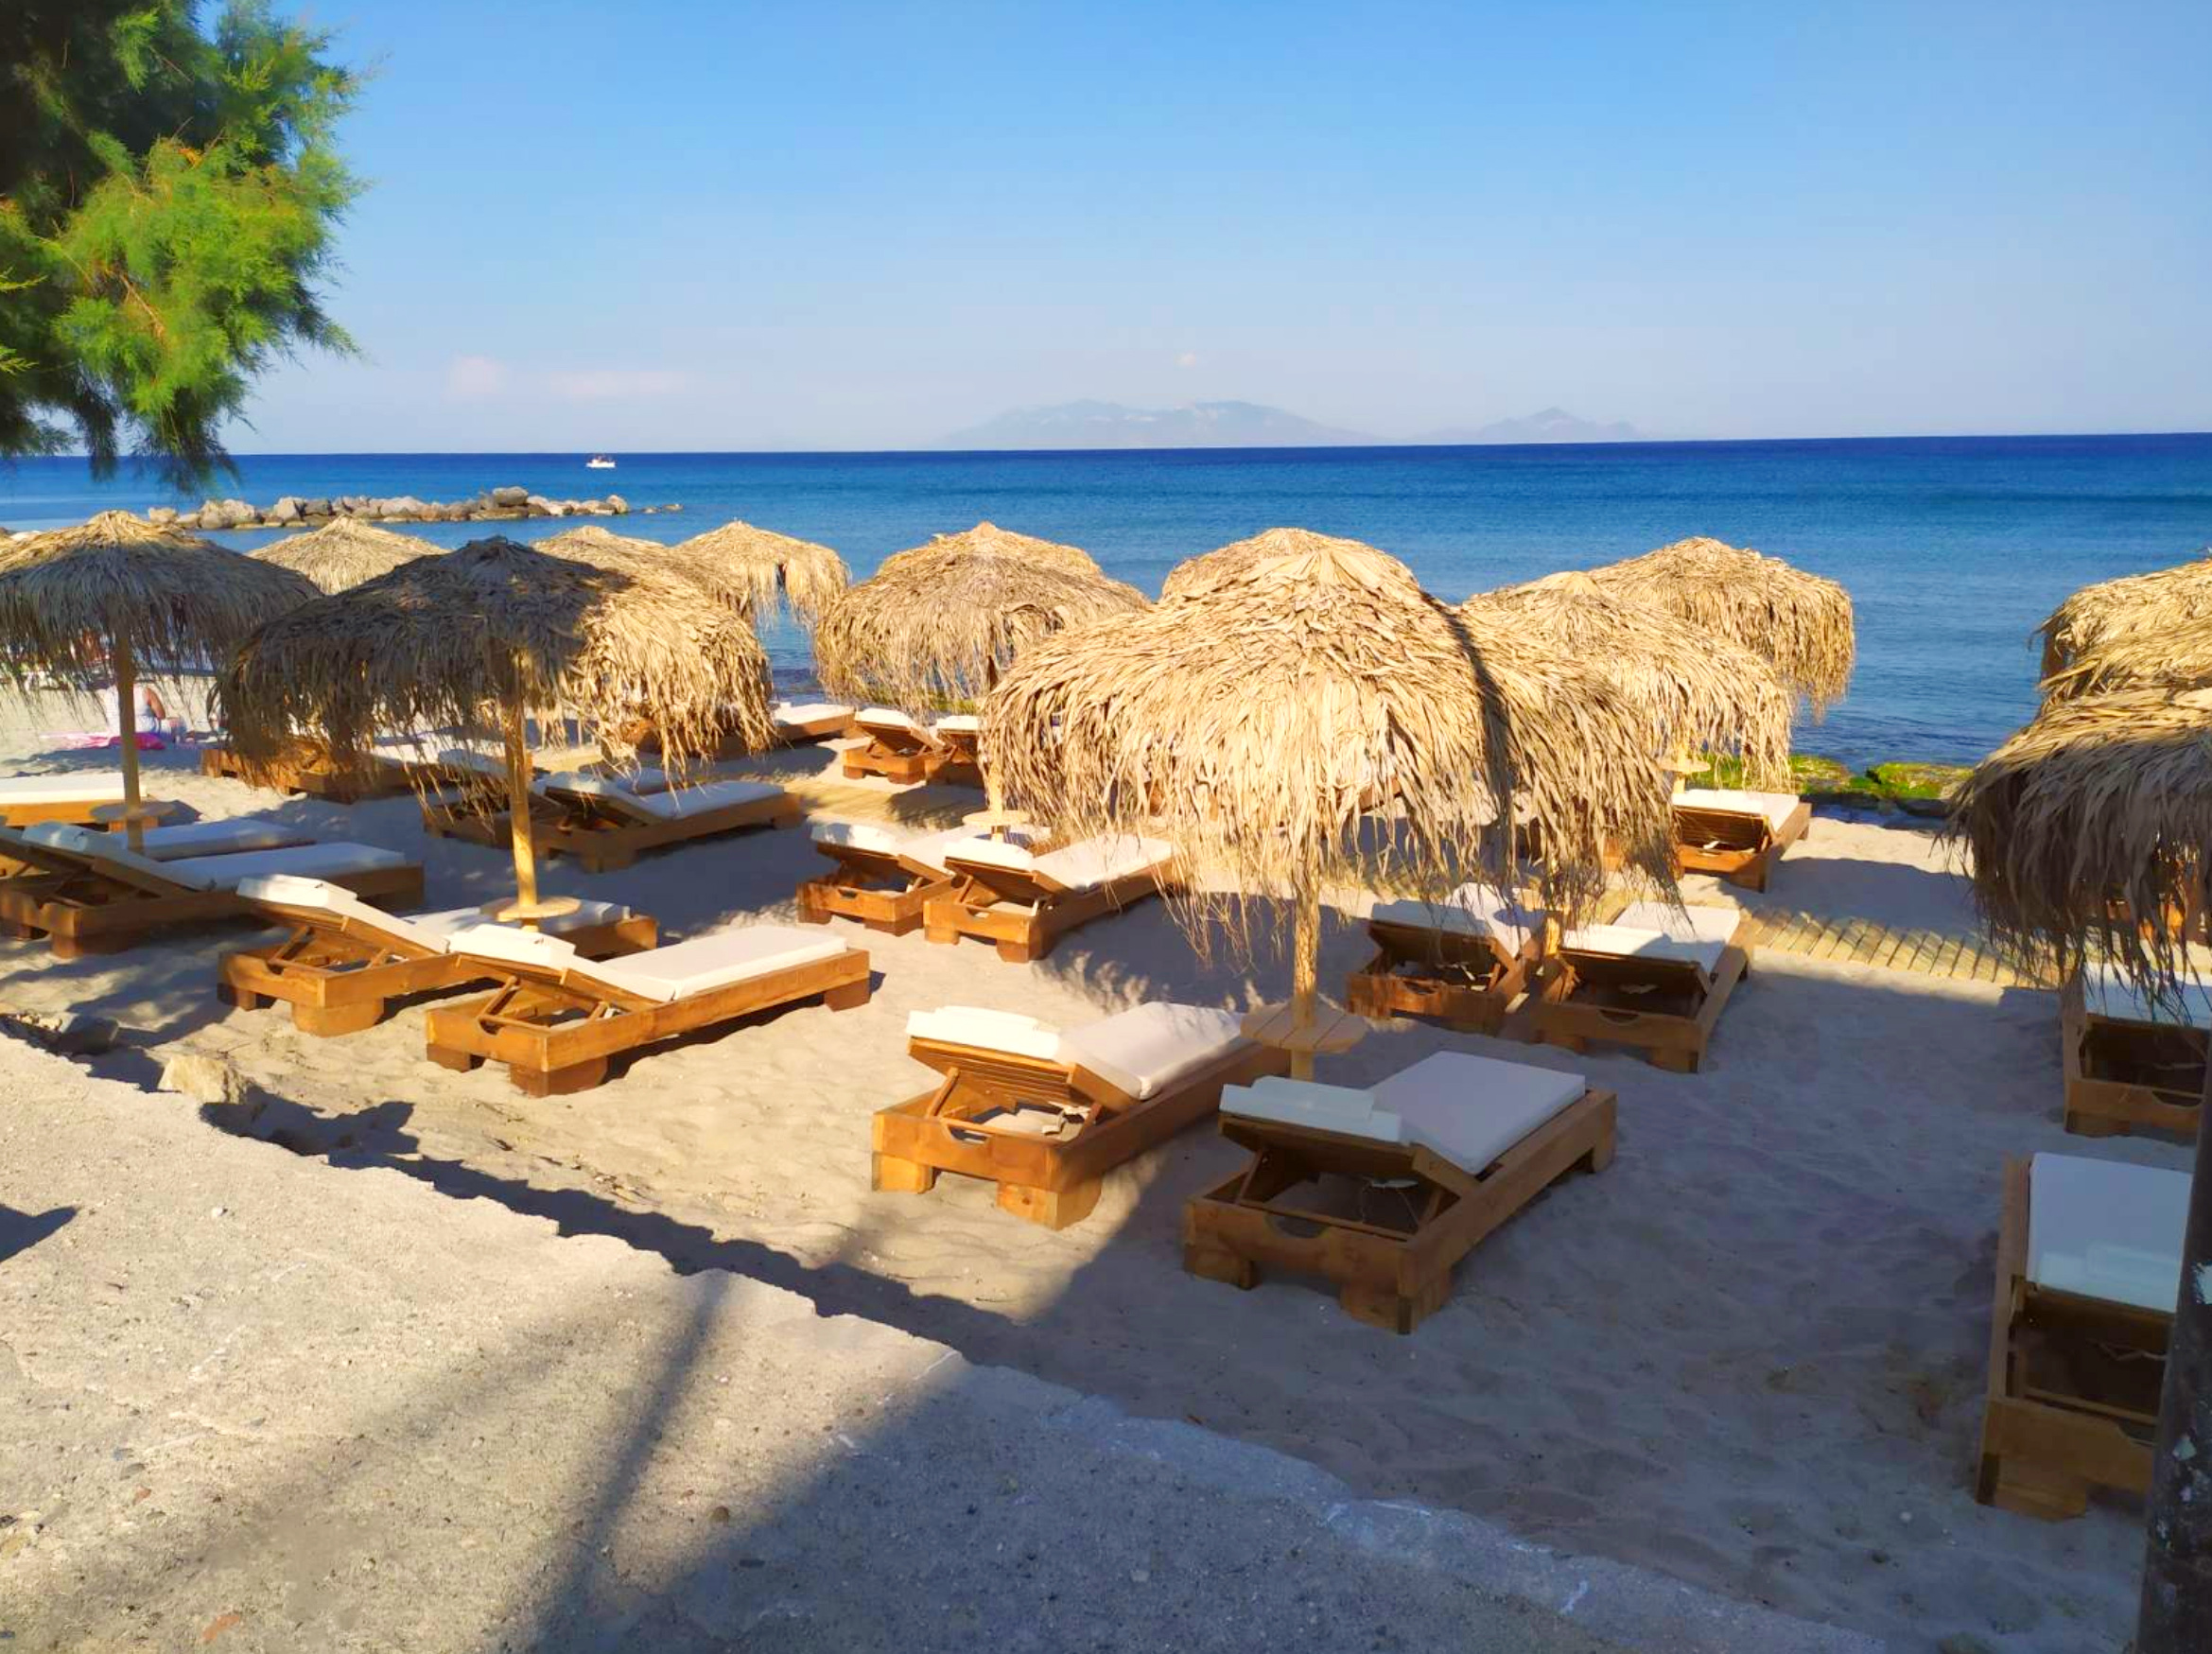 Sunbeds & Umbrellas by the Beach